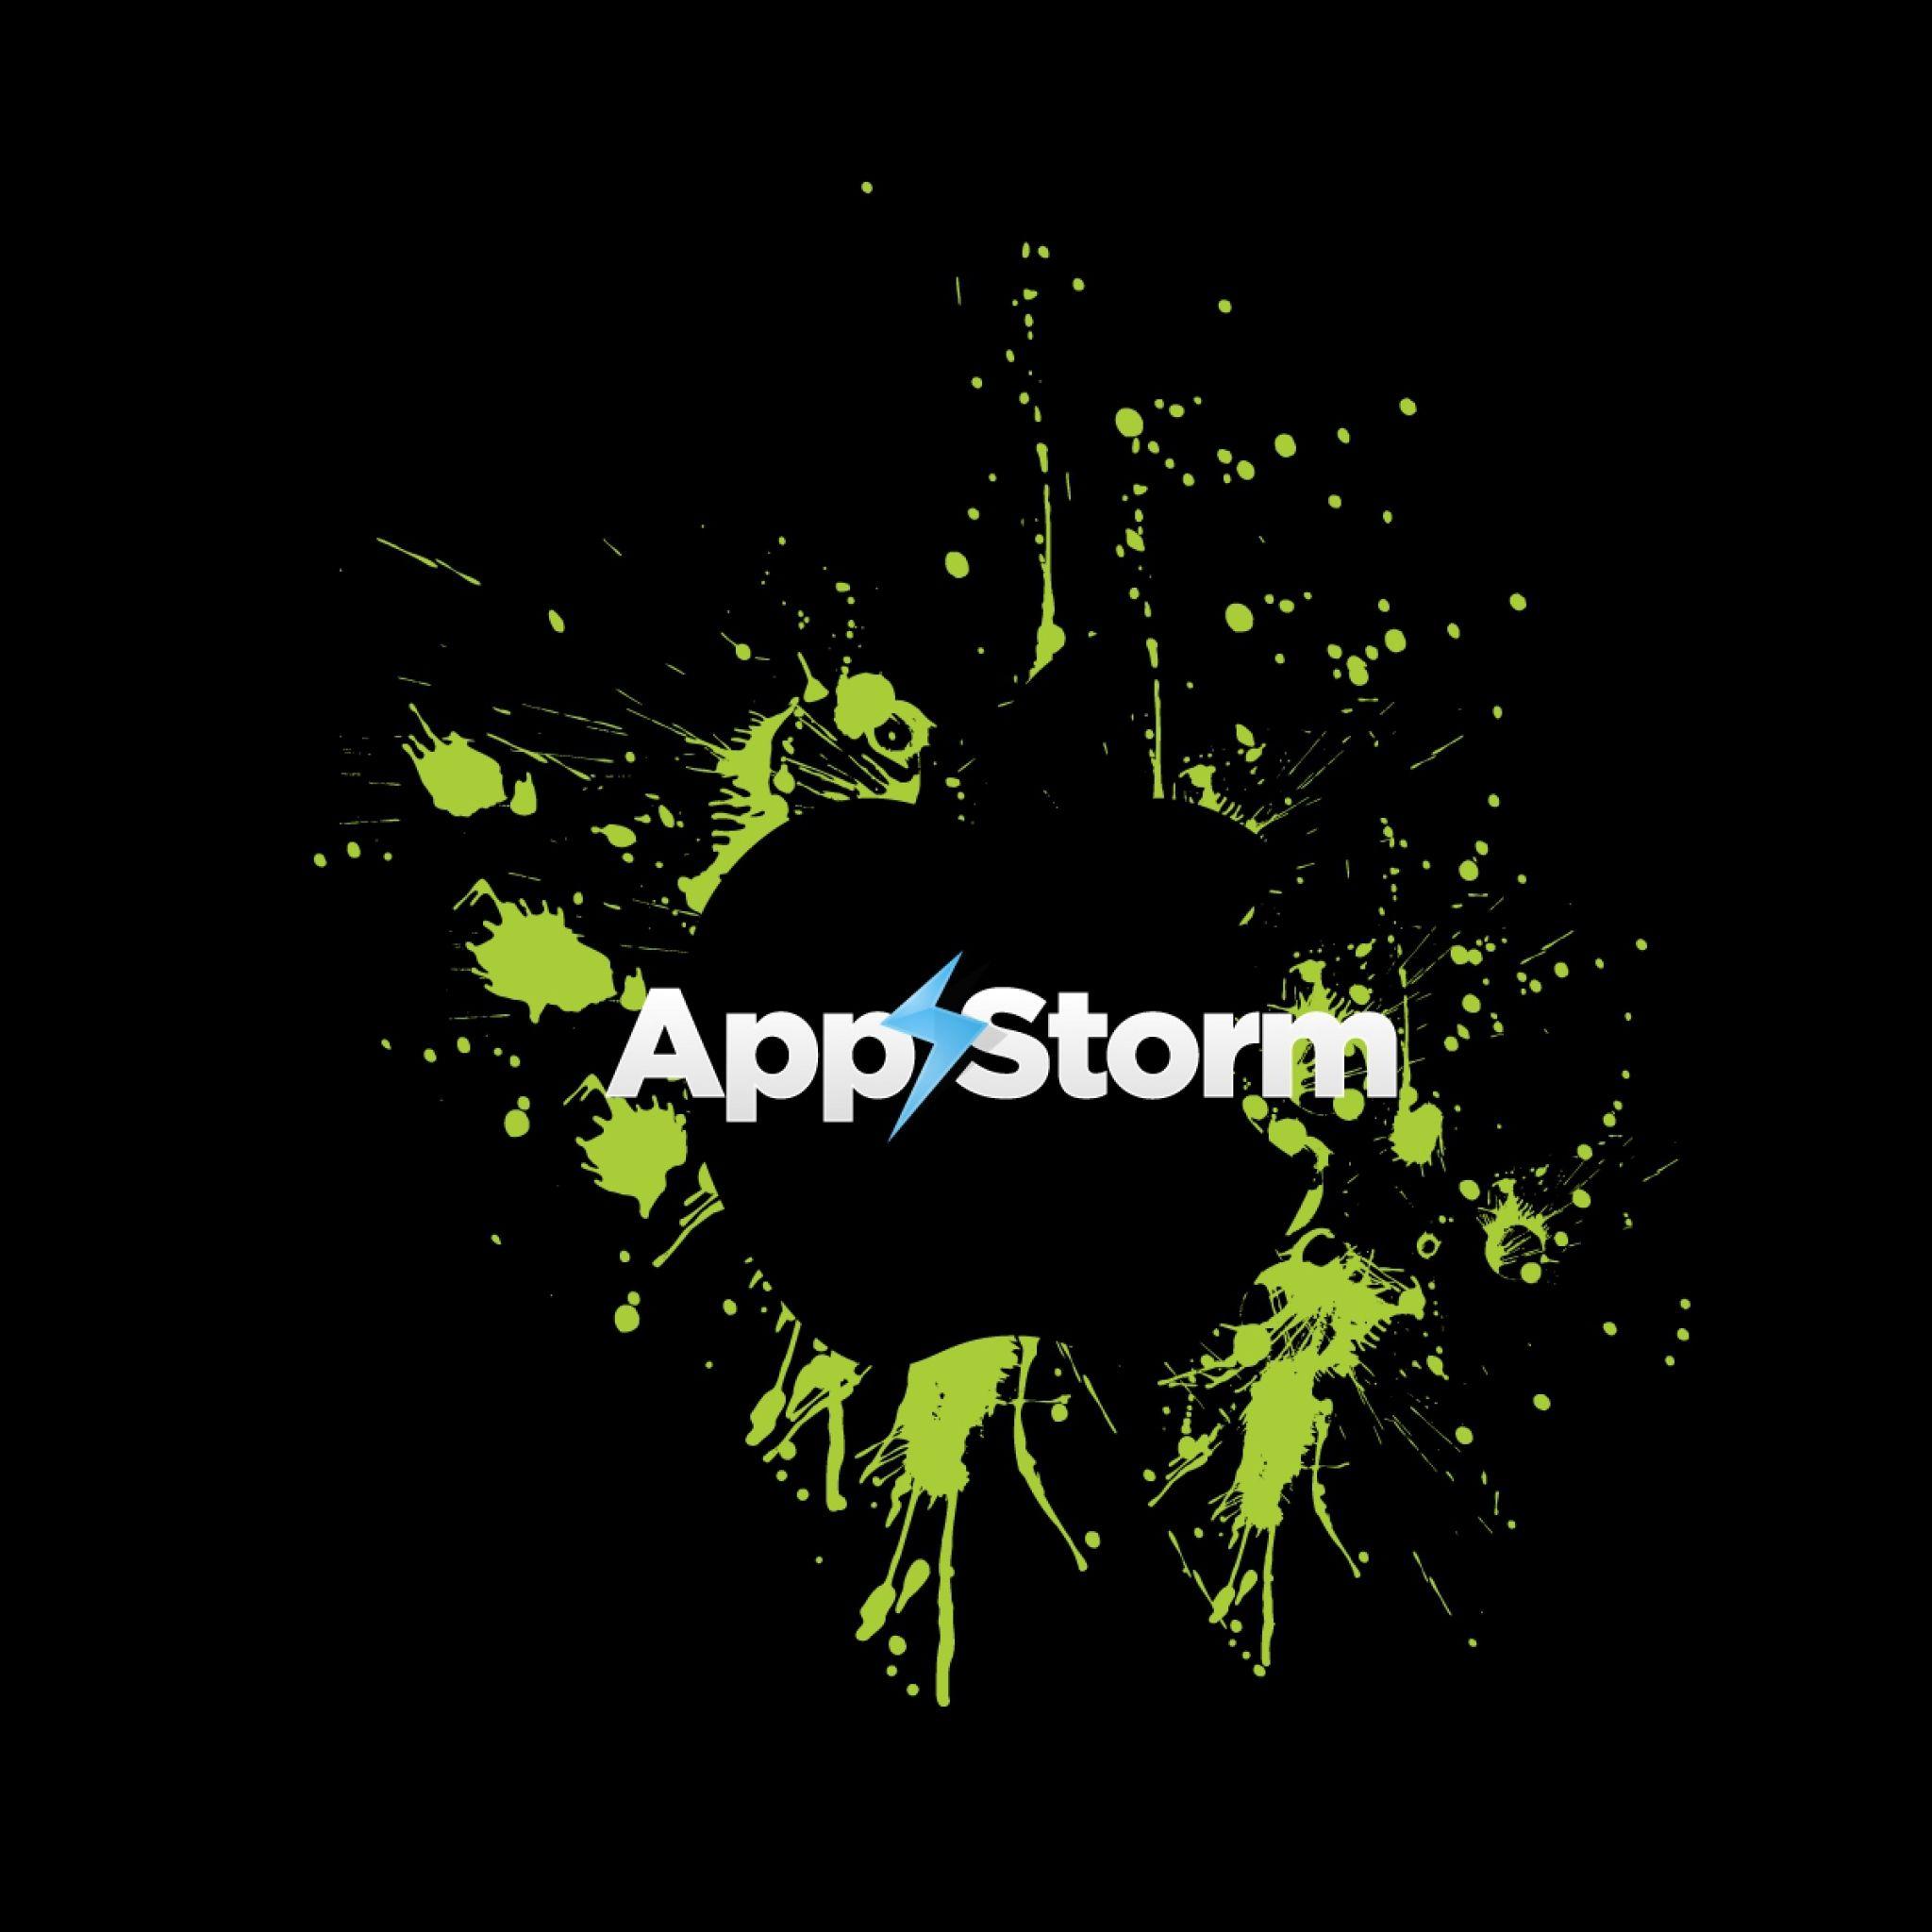 2048x2048 Wallpaper App Store Apple Mac Green Black Blotch